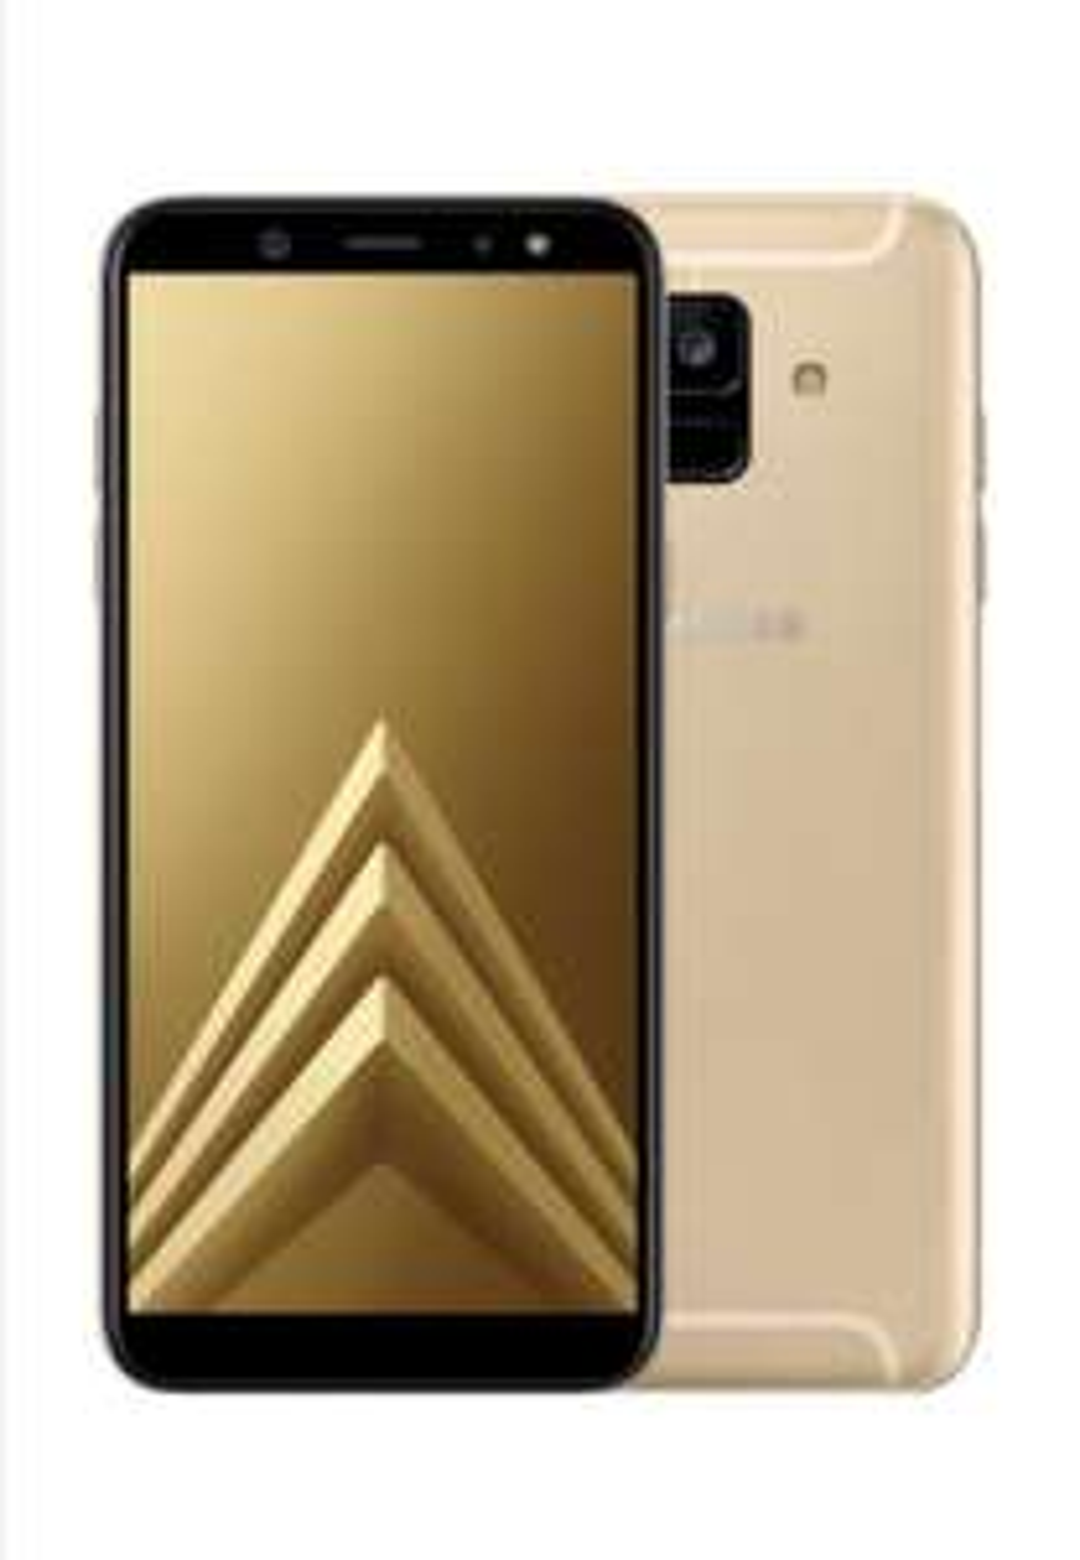 Samsung Galaxy A6 (2018) 32GB Gold, Lavender Dual Sim für 154€[Media Markt Masterpass]